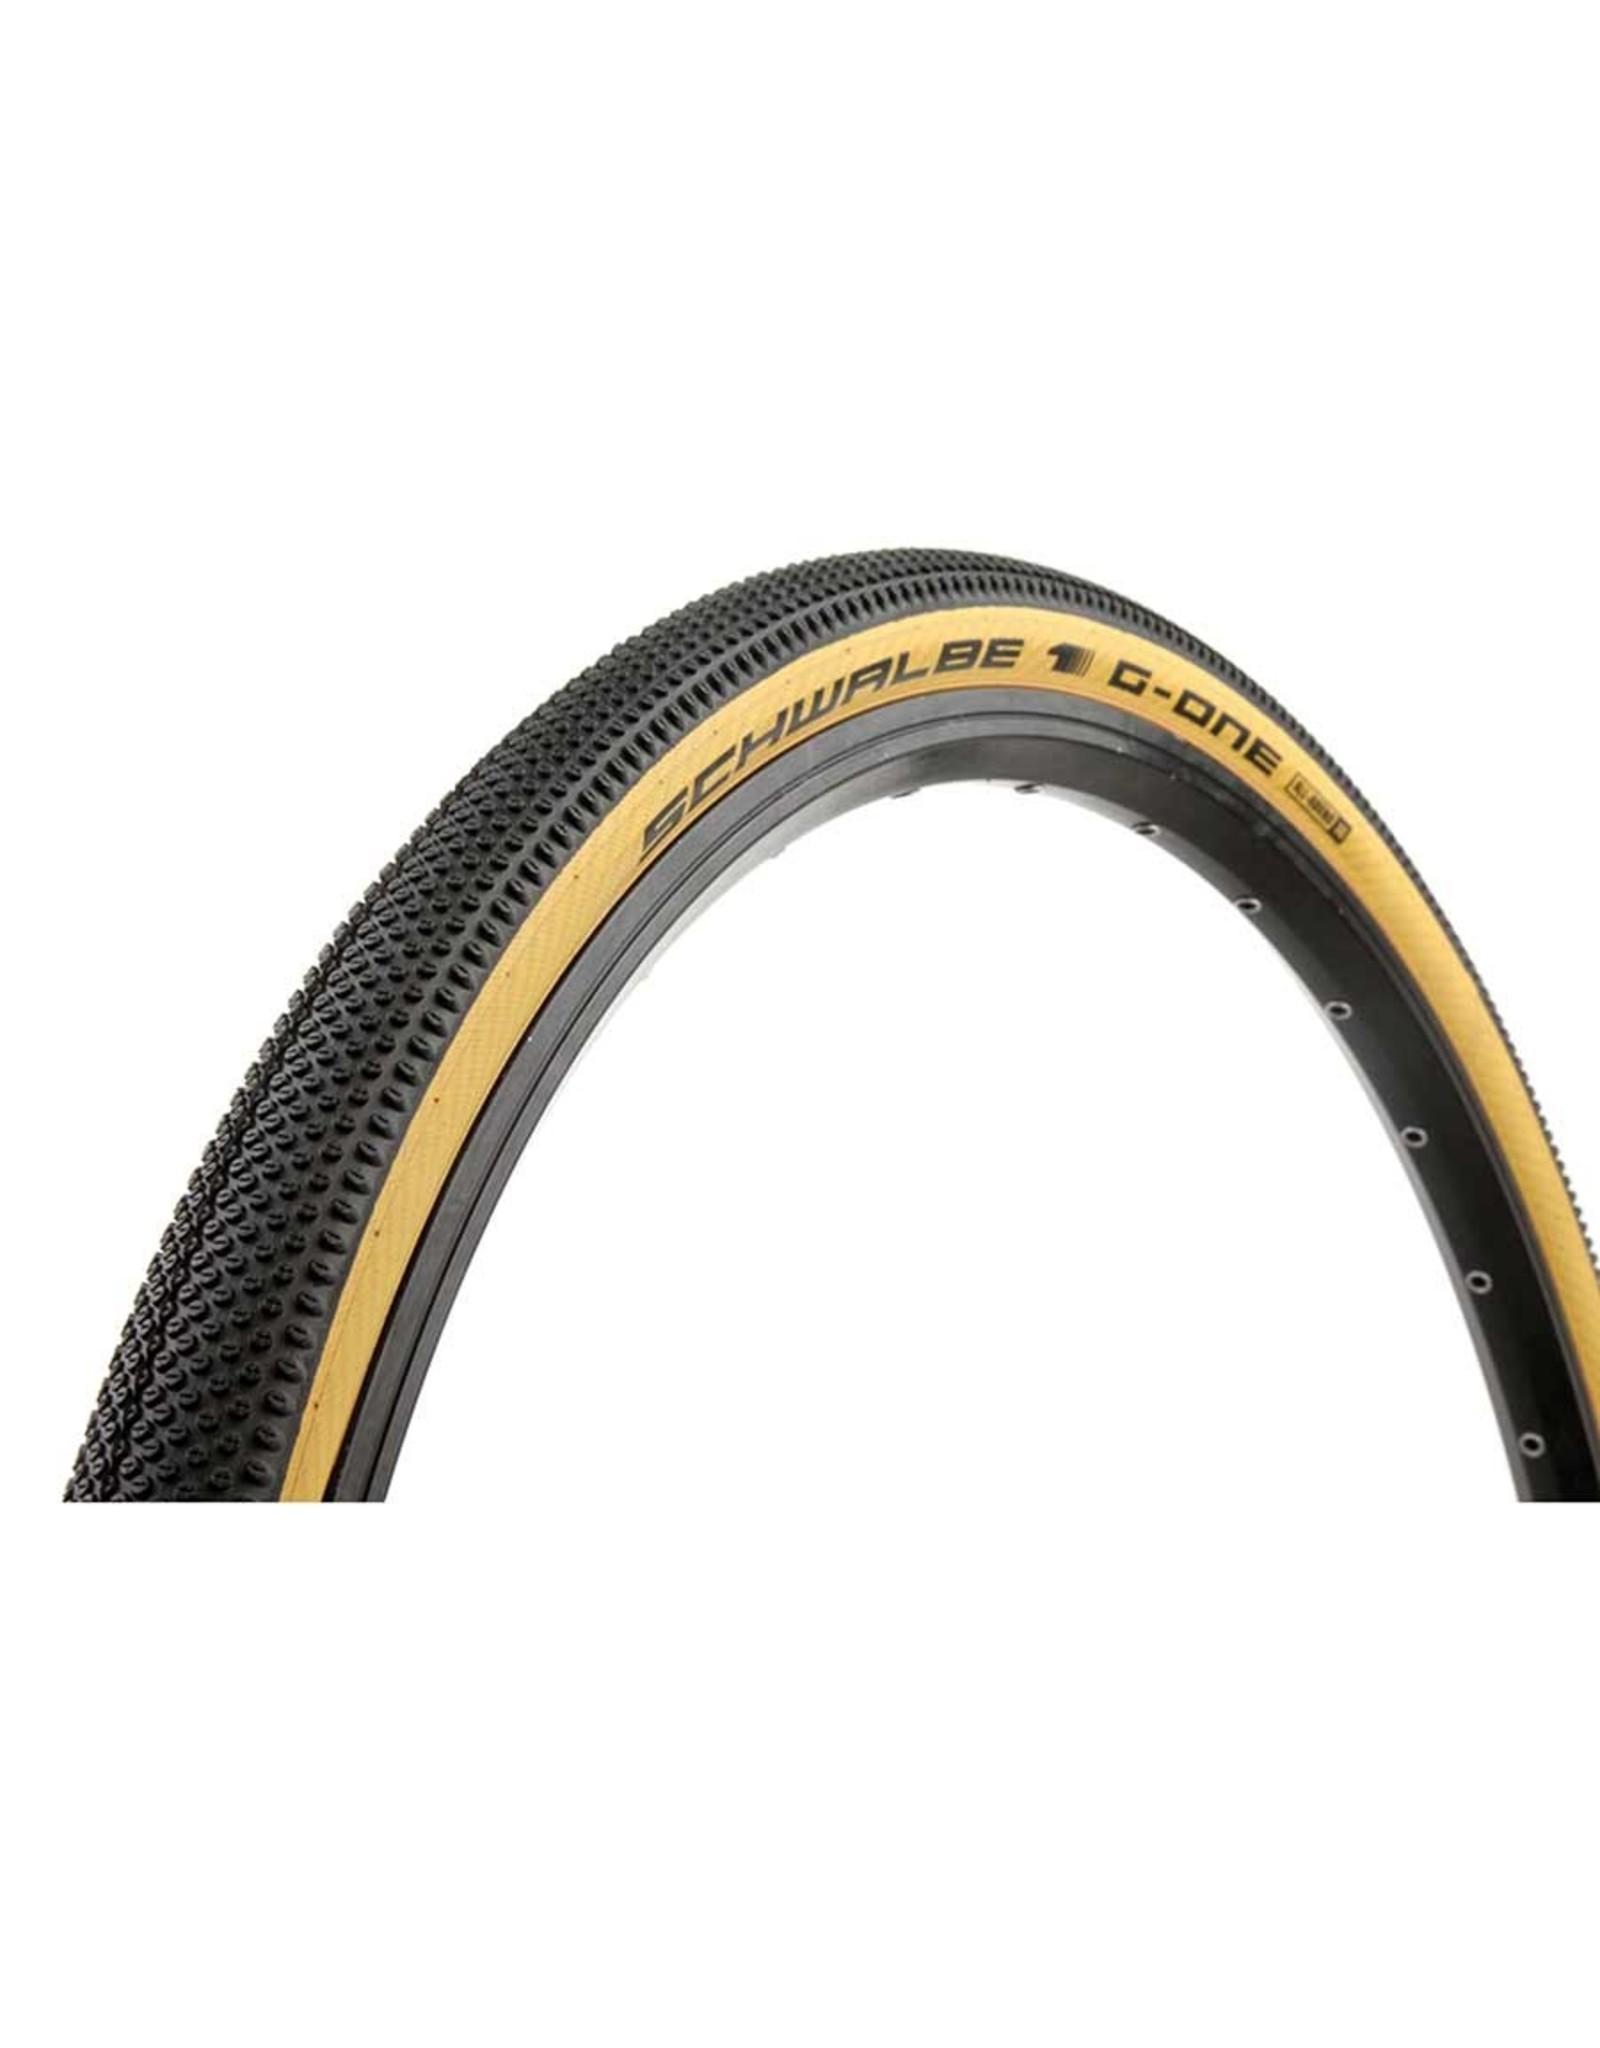 SCHWALBE Schwalbe, G-One Allround, Tire, 700x38C, Folding, Tubeless Ready, Addix, RaceGuard, 67TPI, Tanwall